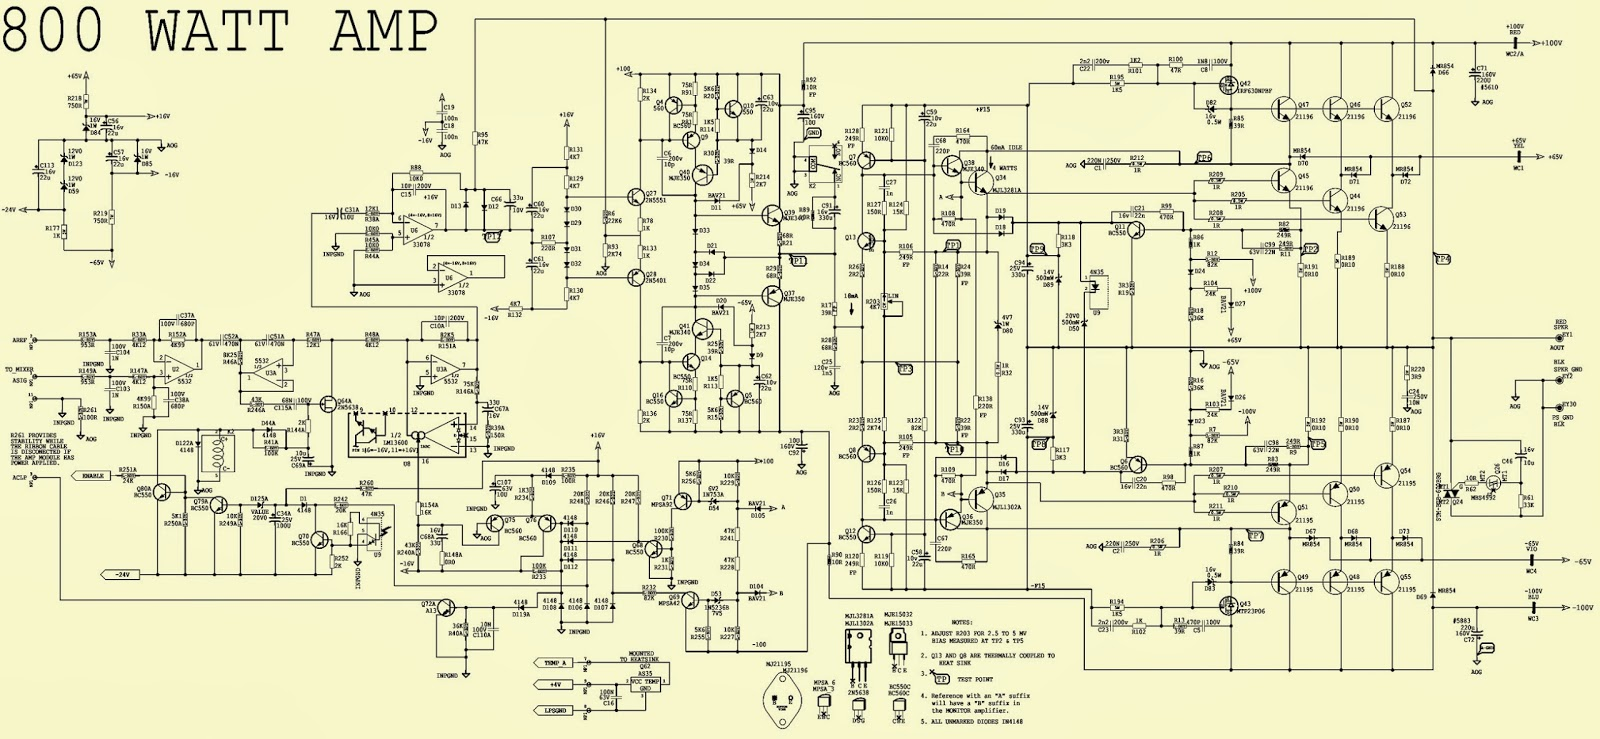 medium resolution of 800watts amplifier circuit diagram 800 watts amp 800watts amplifier circuit diagram